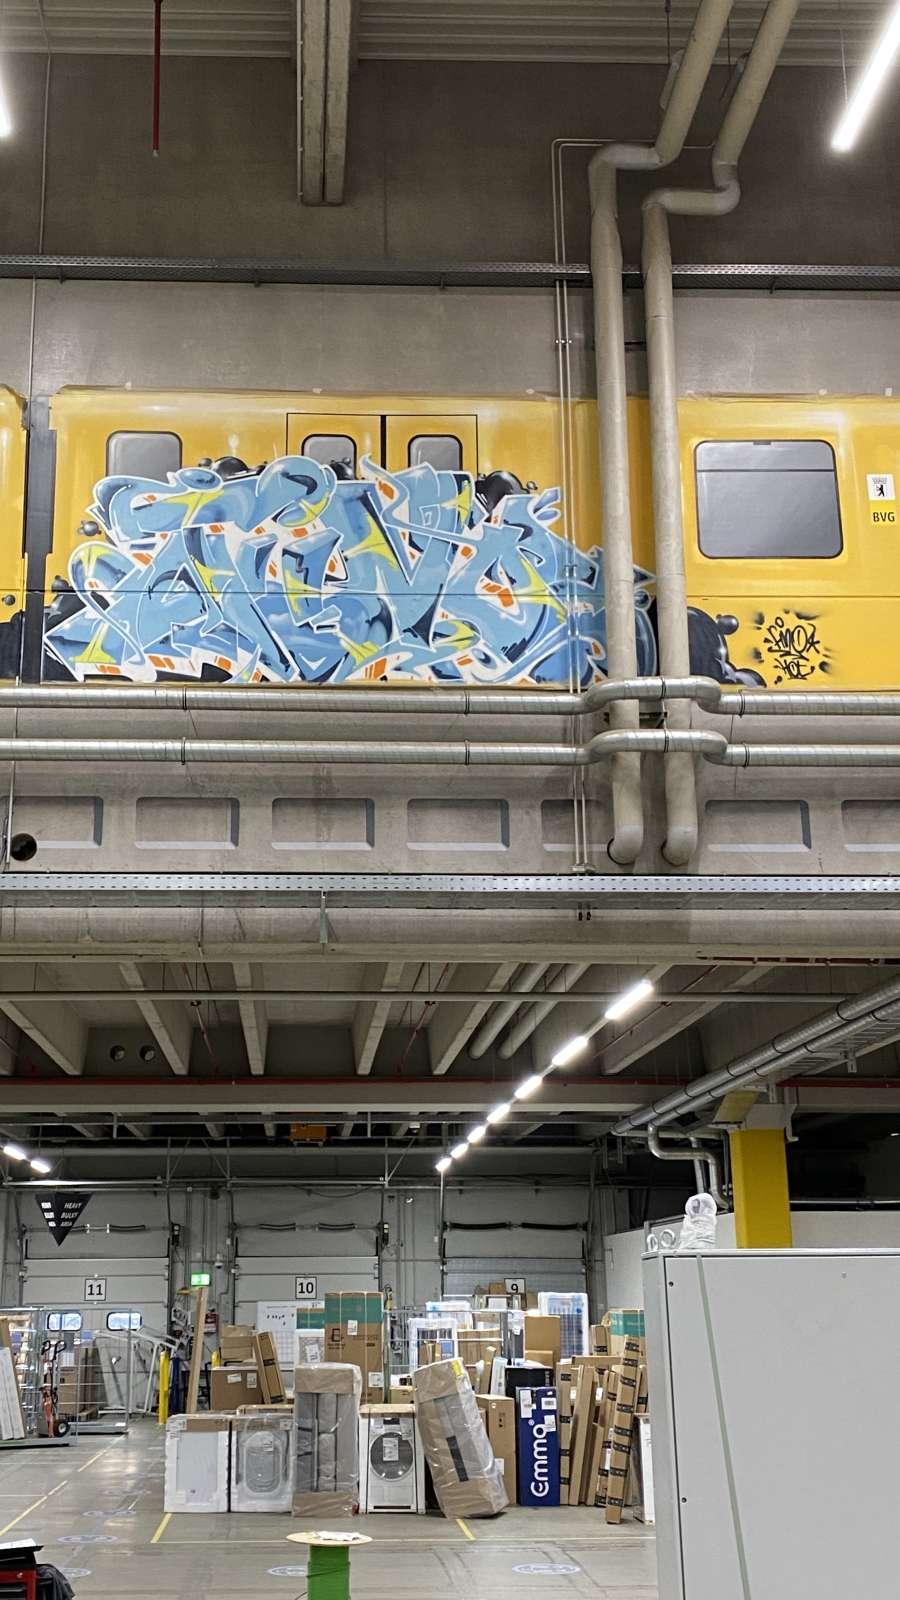 Amazon_berlin_2021_graffiti_tier_ubahn_innen_gelb_blau_graffiti_tags_logistik_15_artmos4_graffitiauftrag_graffitikuenstler